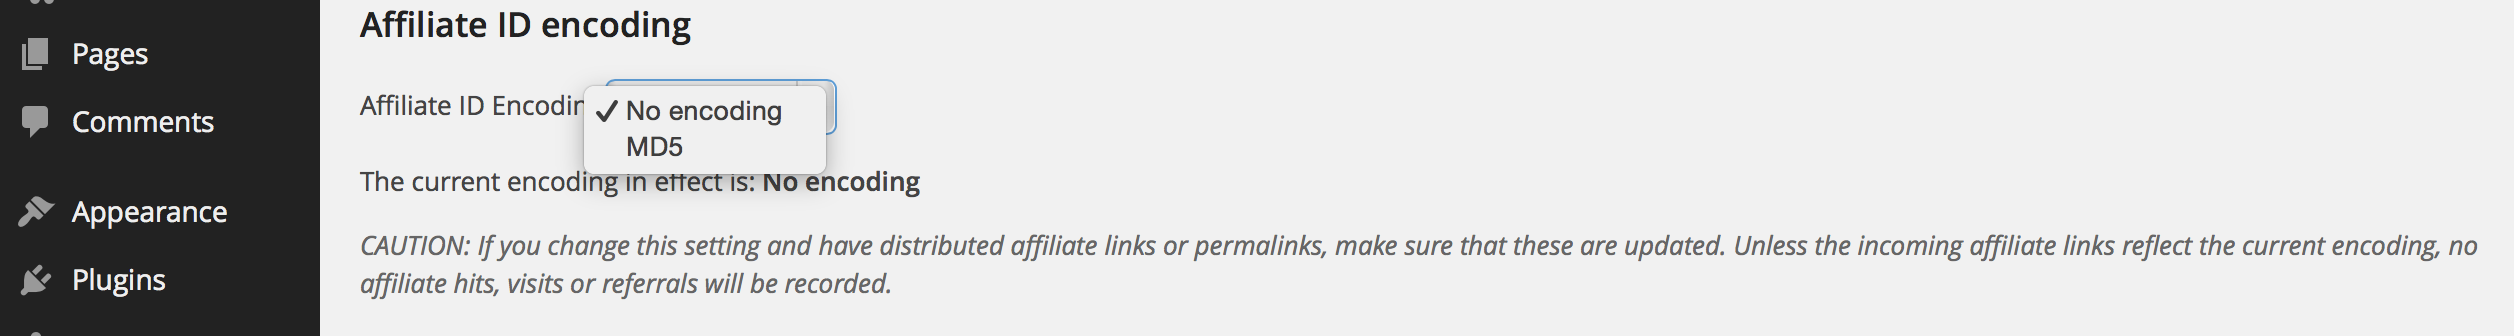 affiliate id encoding (menú abierto)